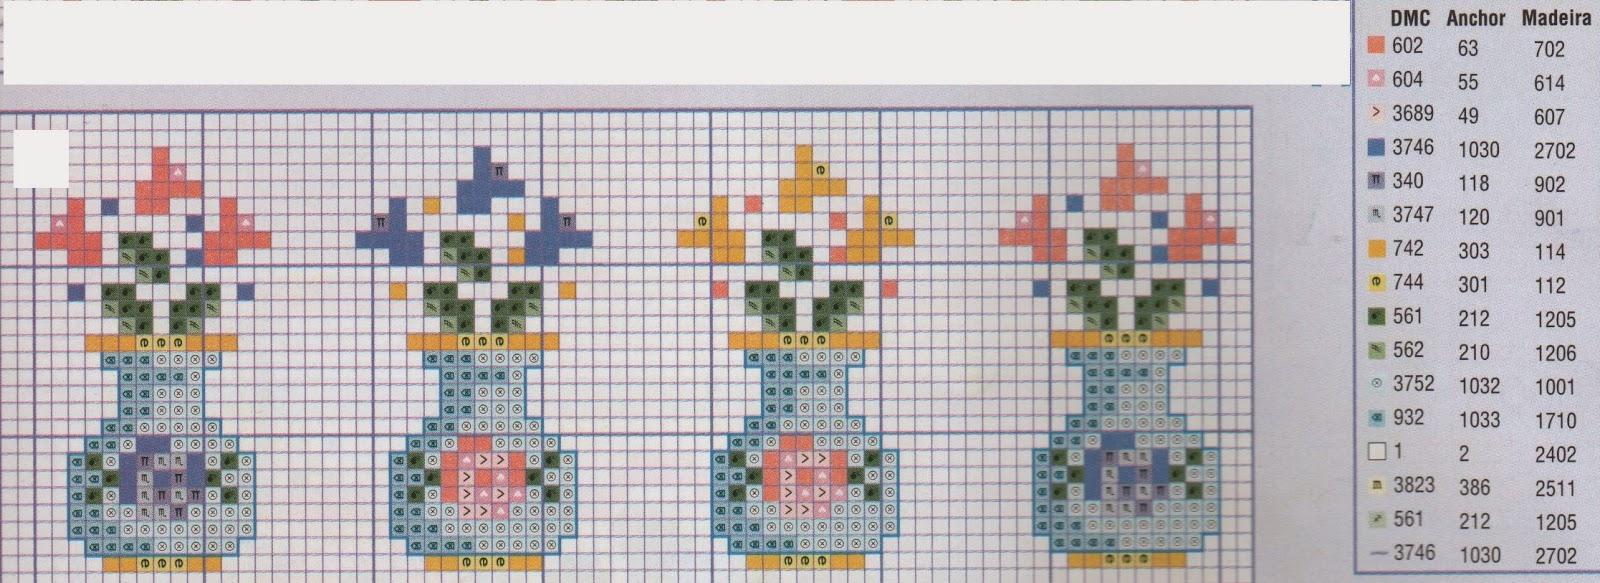 Cenefas flores en punto de cruz gratis punto de cruz - Cenefas punto de cruz para toallas de bano ...